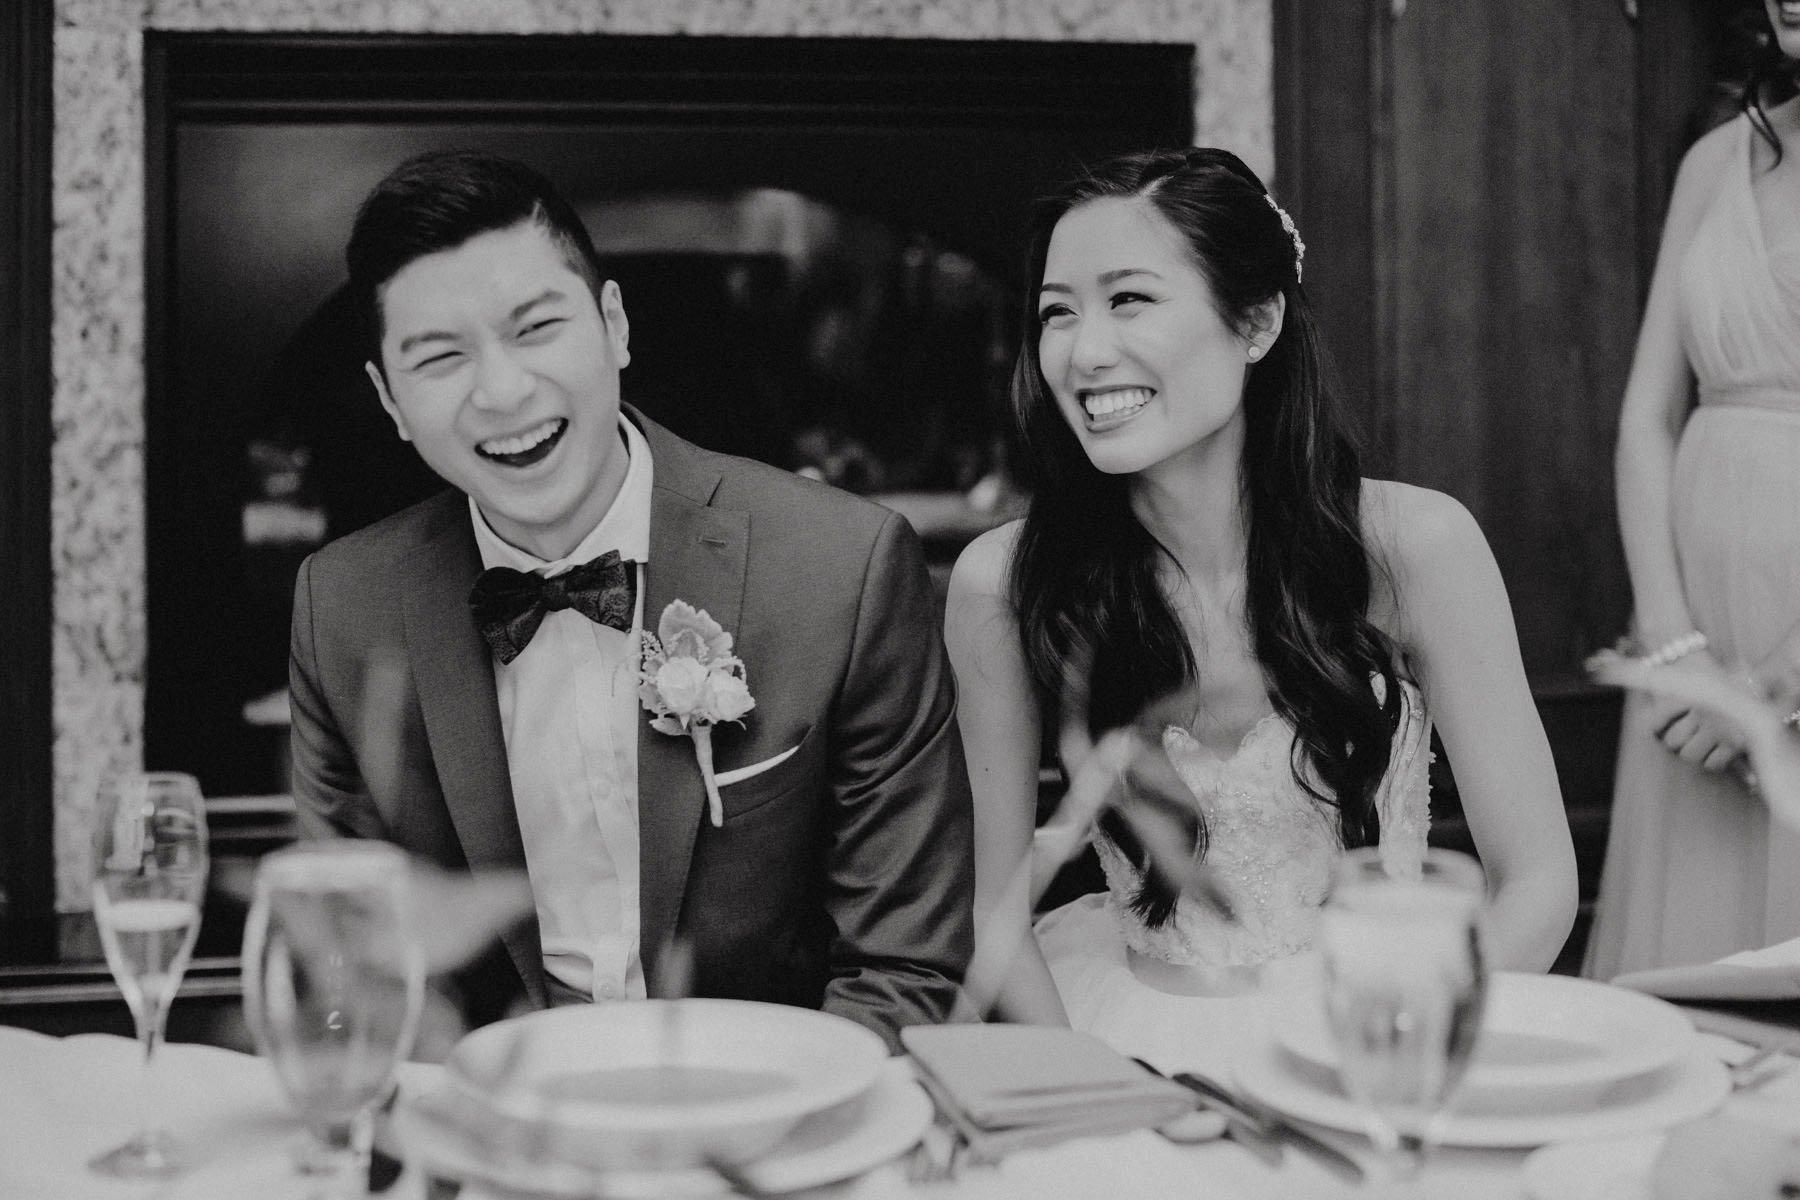 philadelphia-wedding-photographer-149.jpg